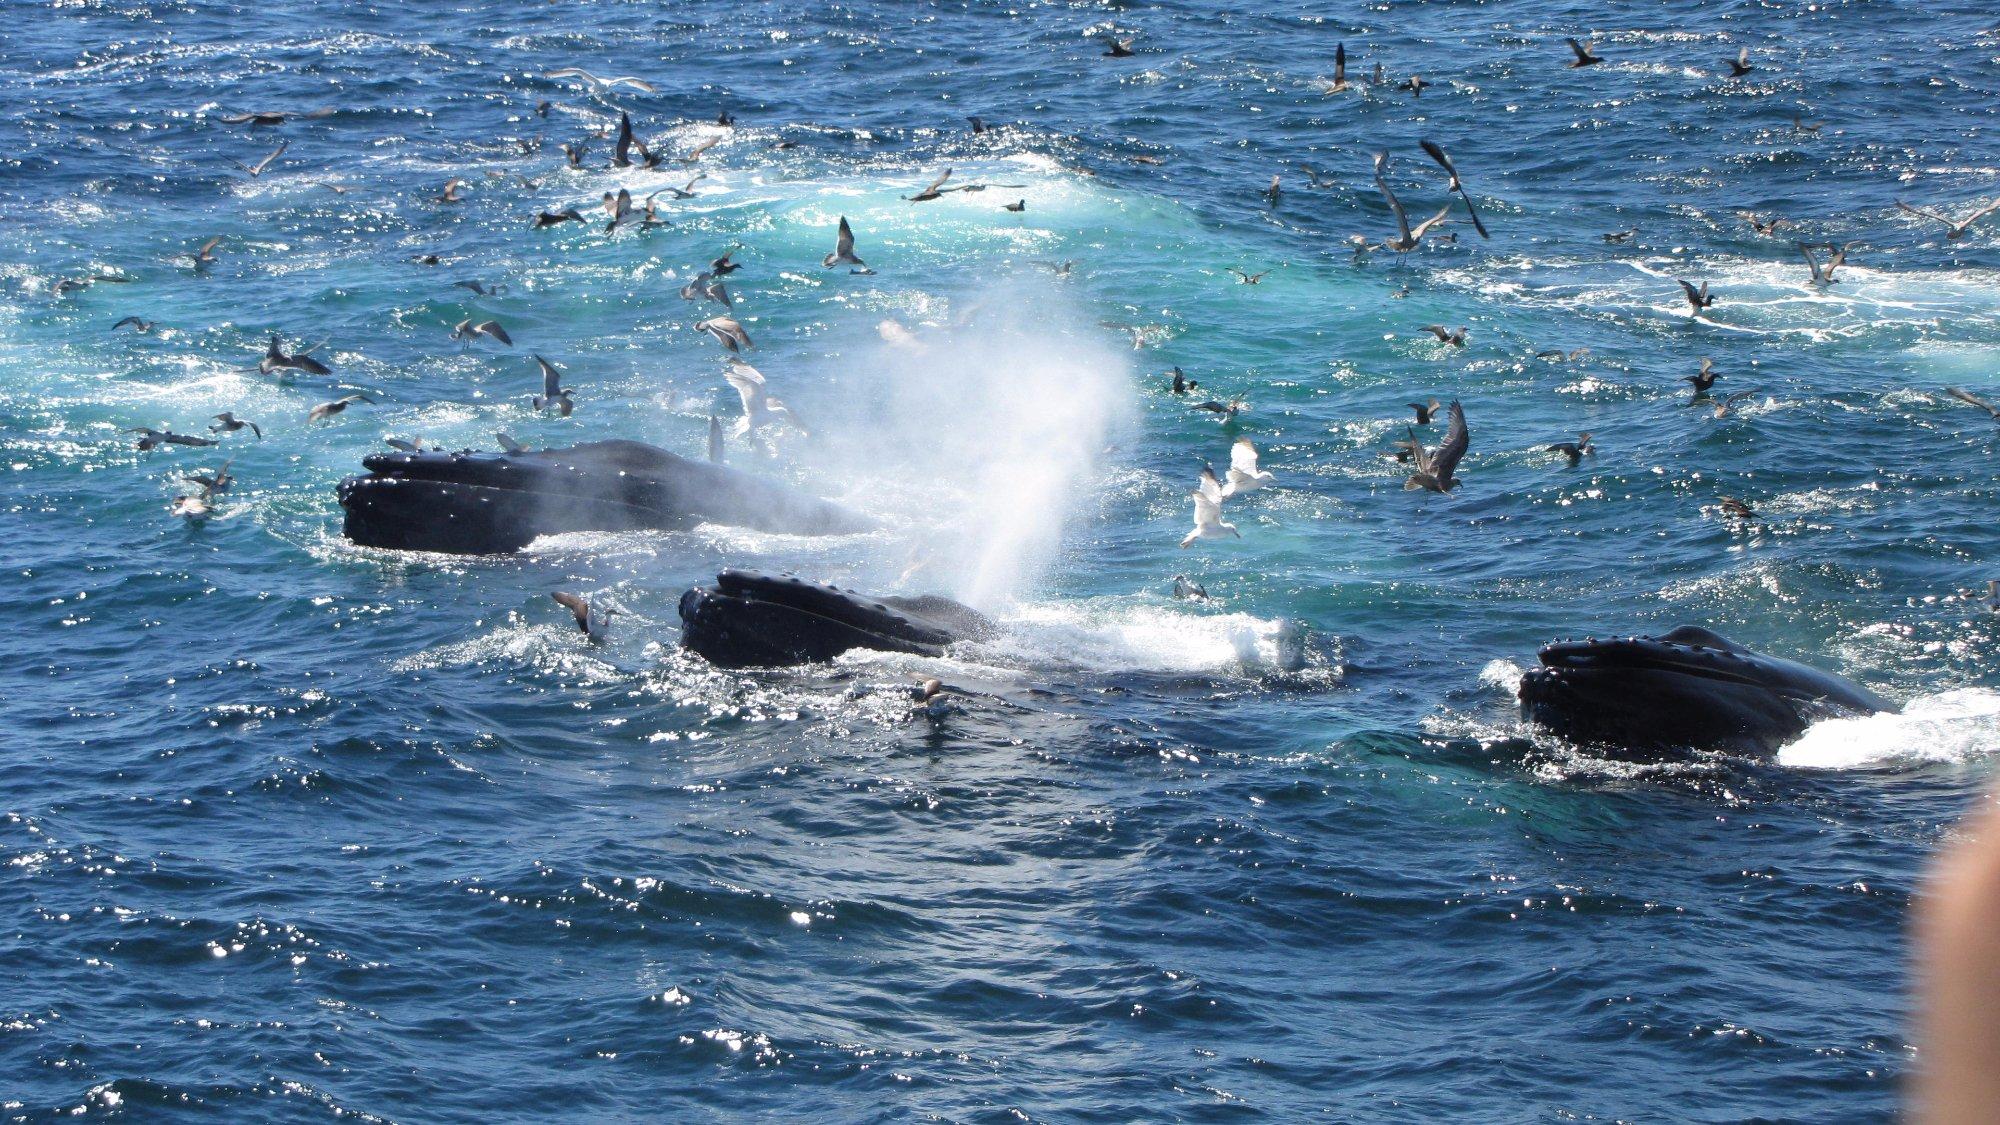 Hyannis Whale Watcher Cruises